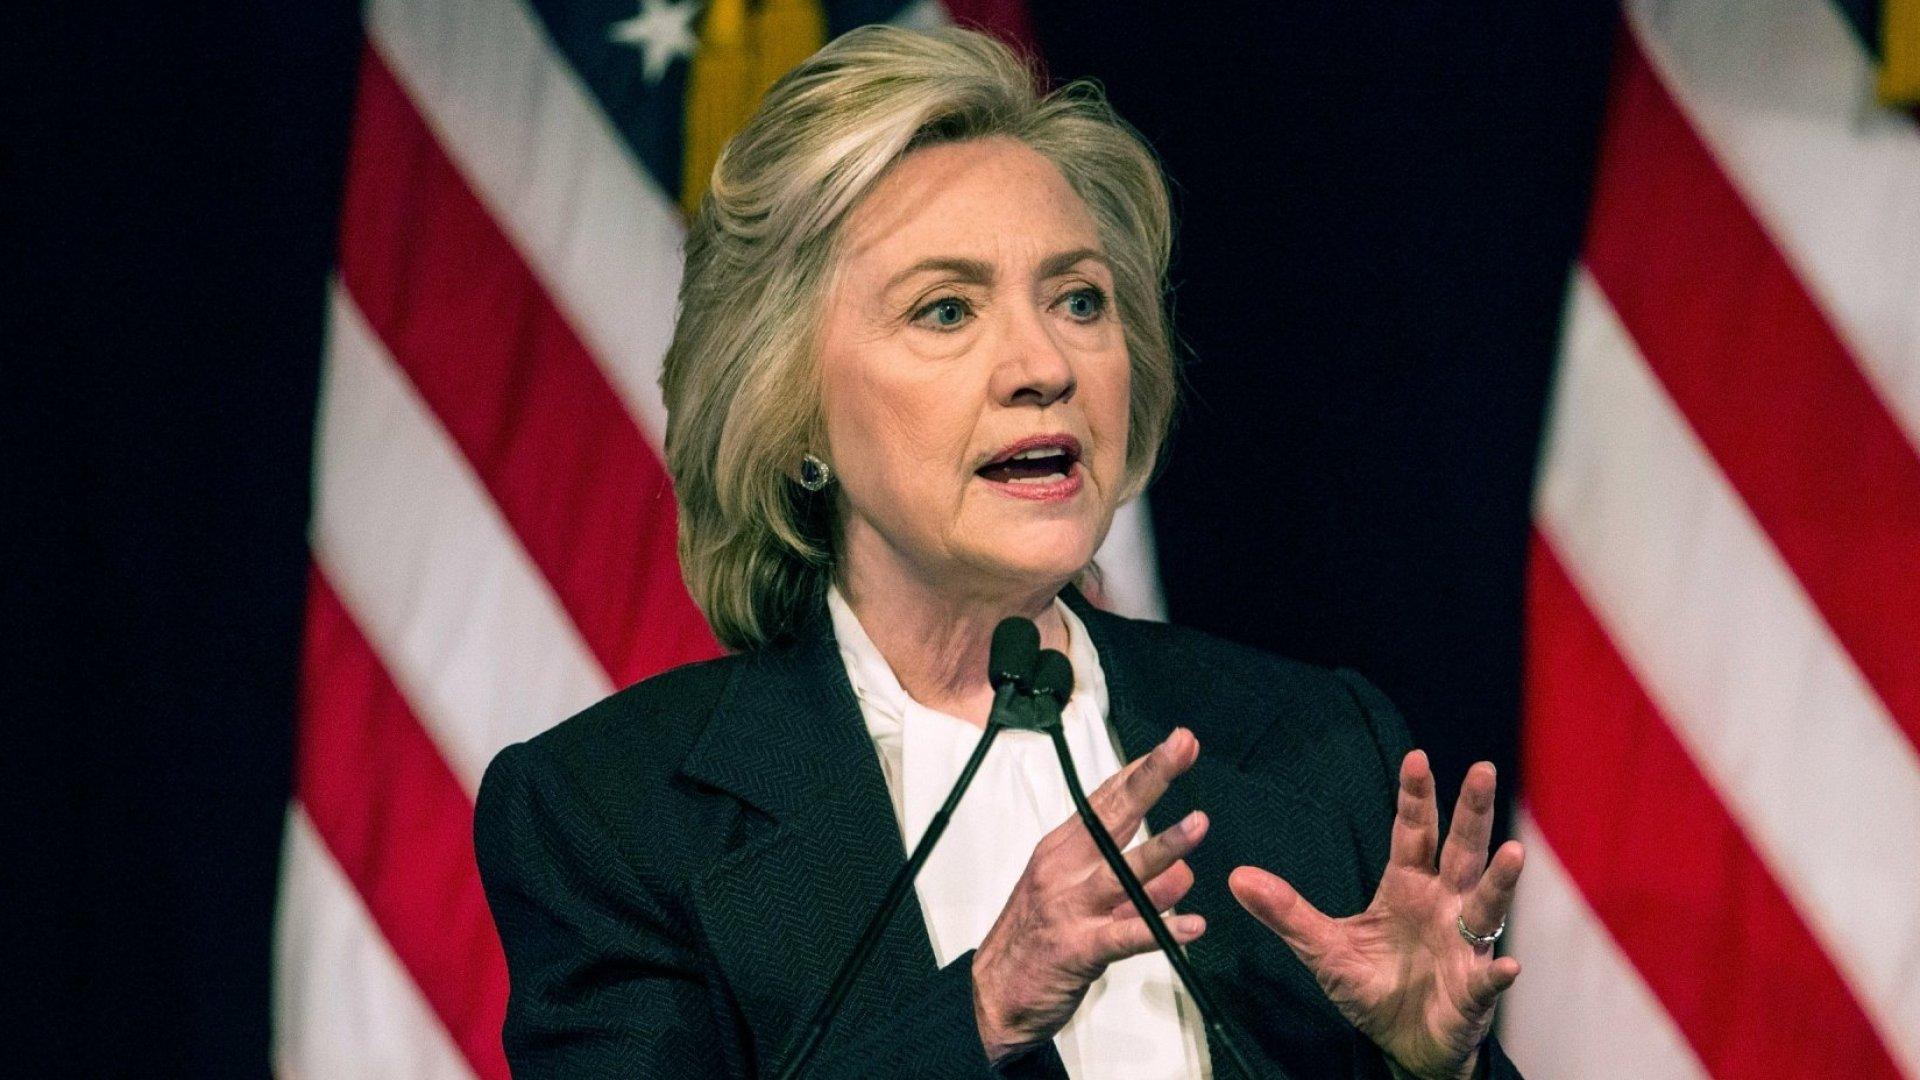 Brace Yourself for 'Hillarynomics'